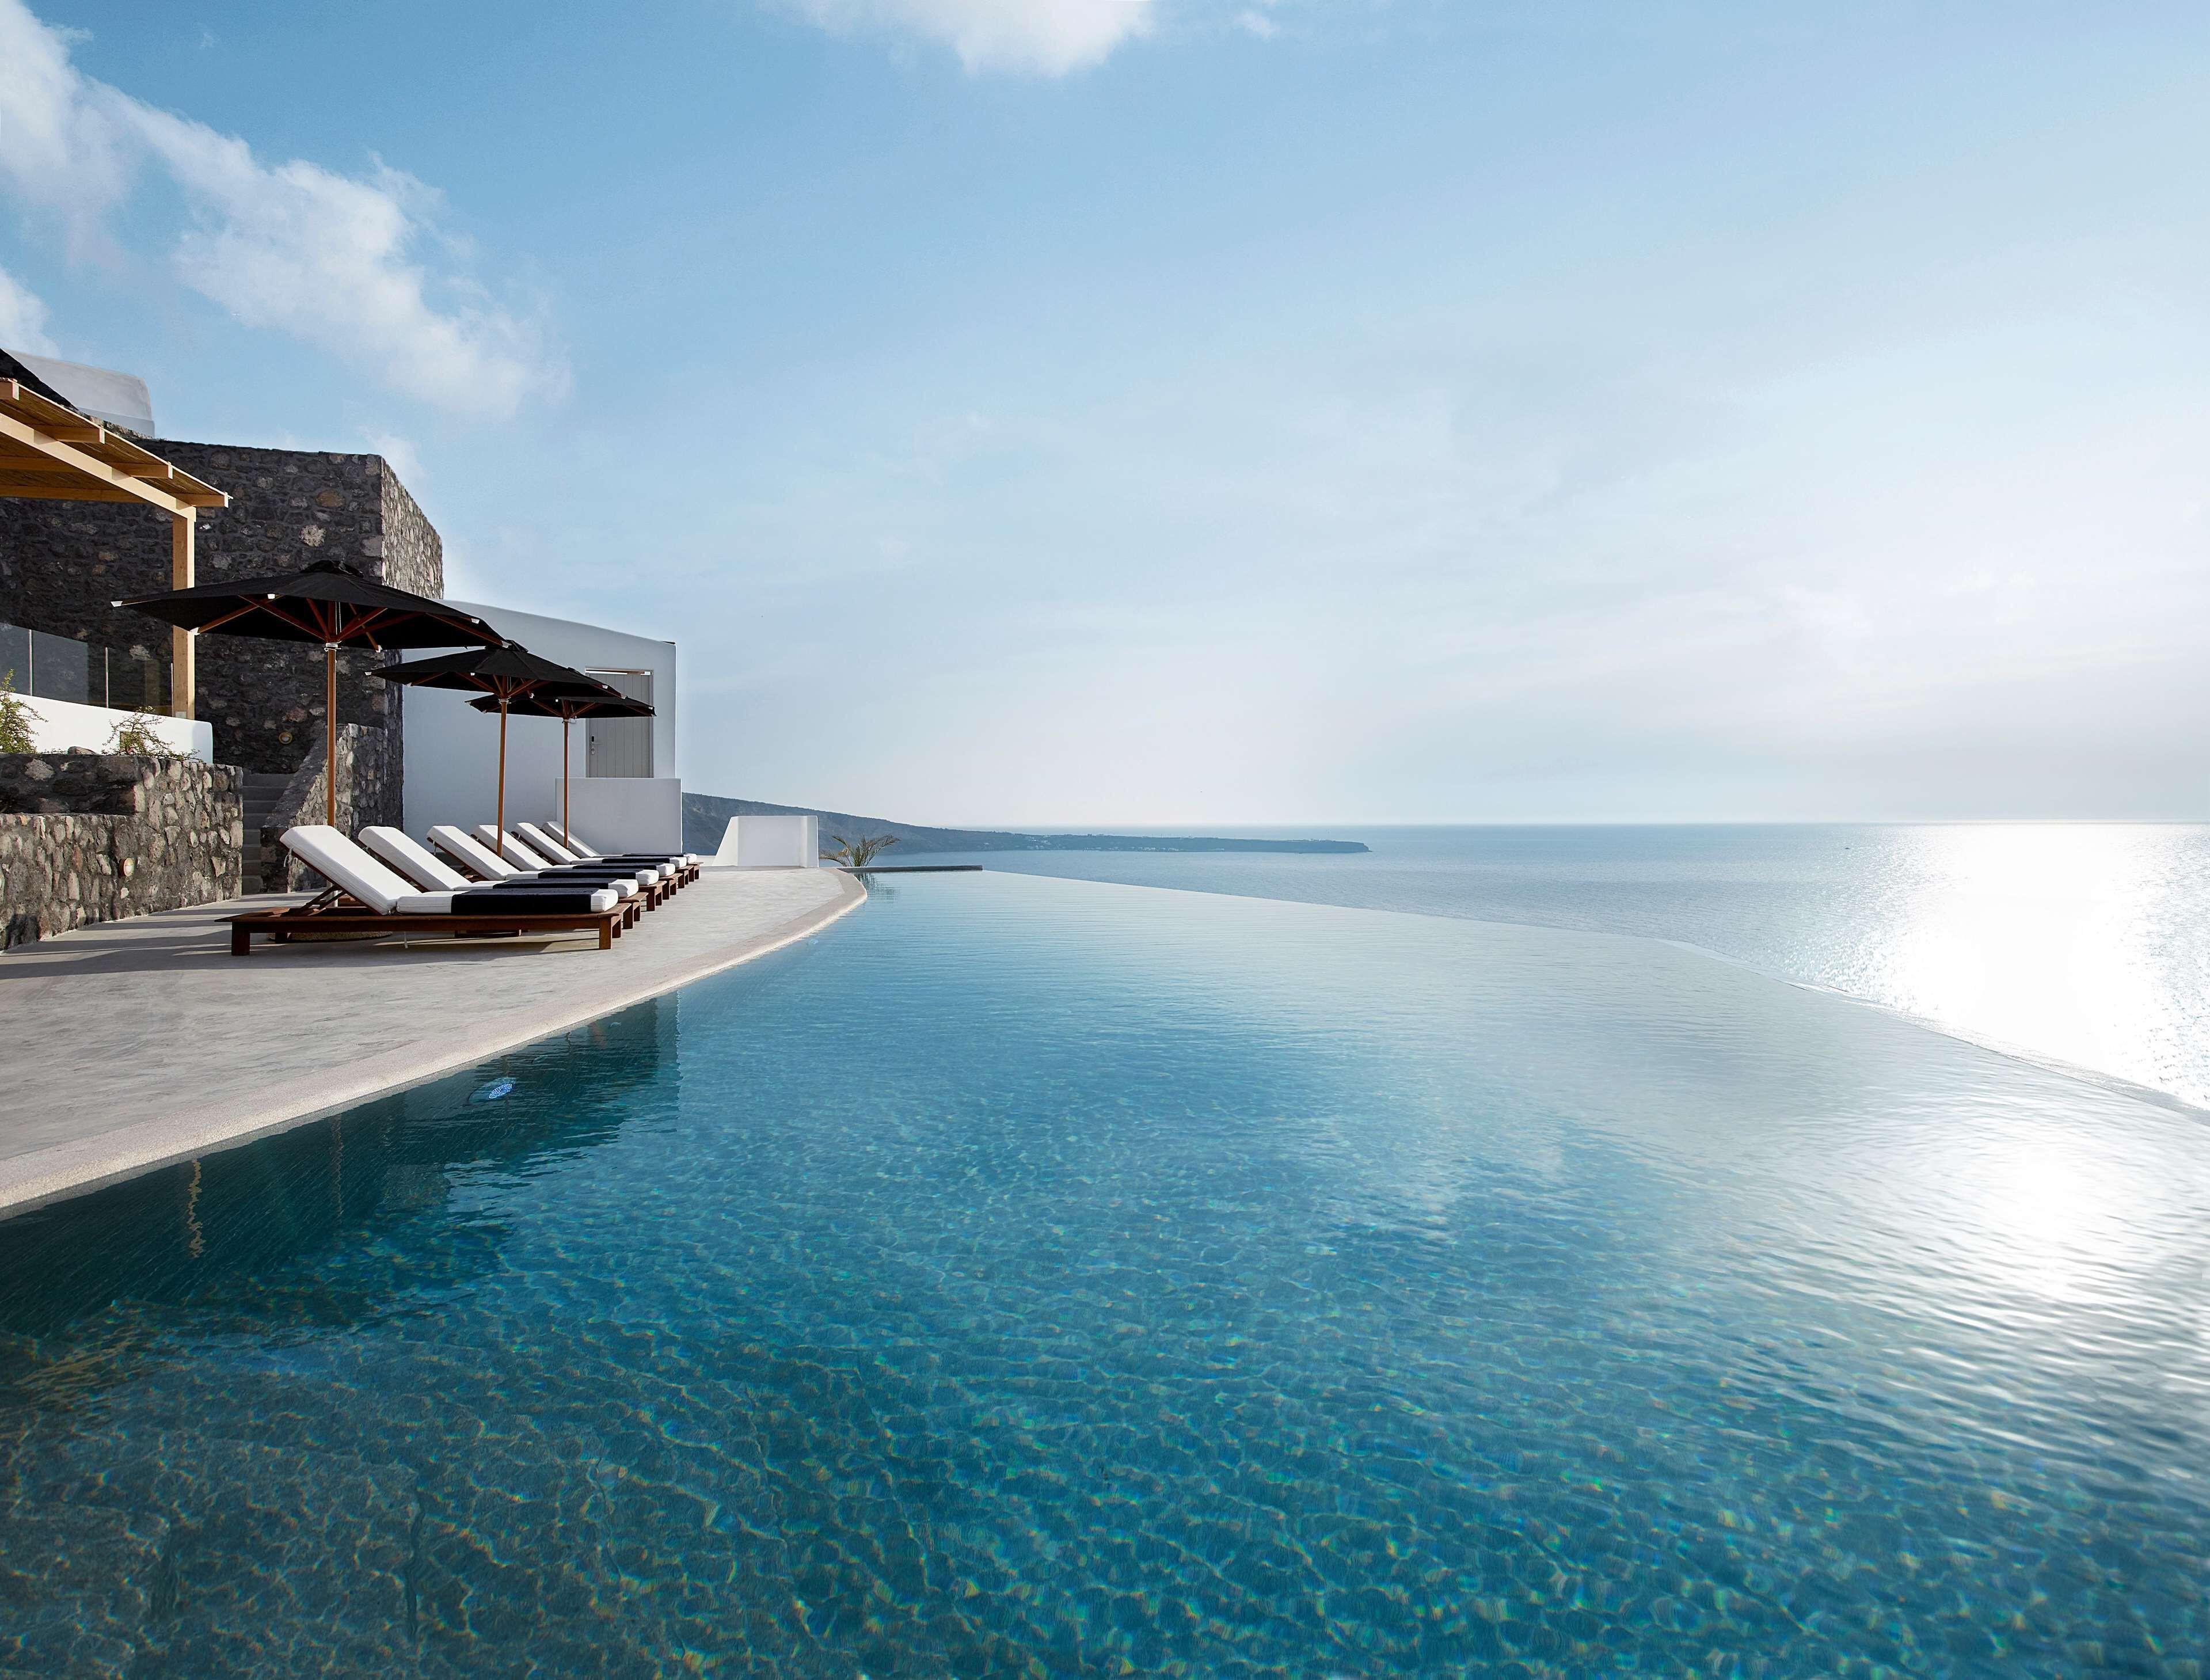 Courtesy of Santo Maris Oia Luxury Suites and Spa / Expedia